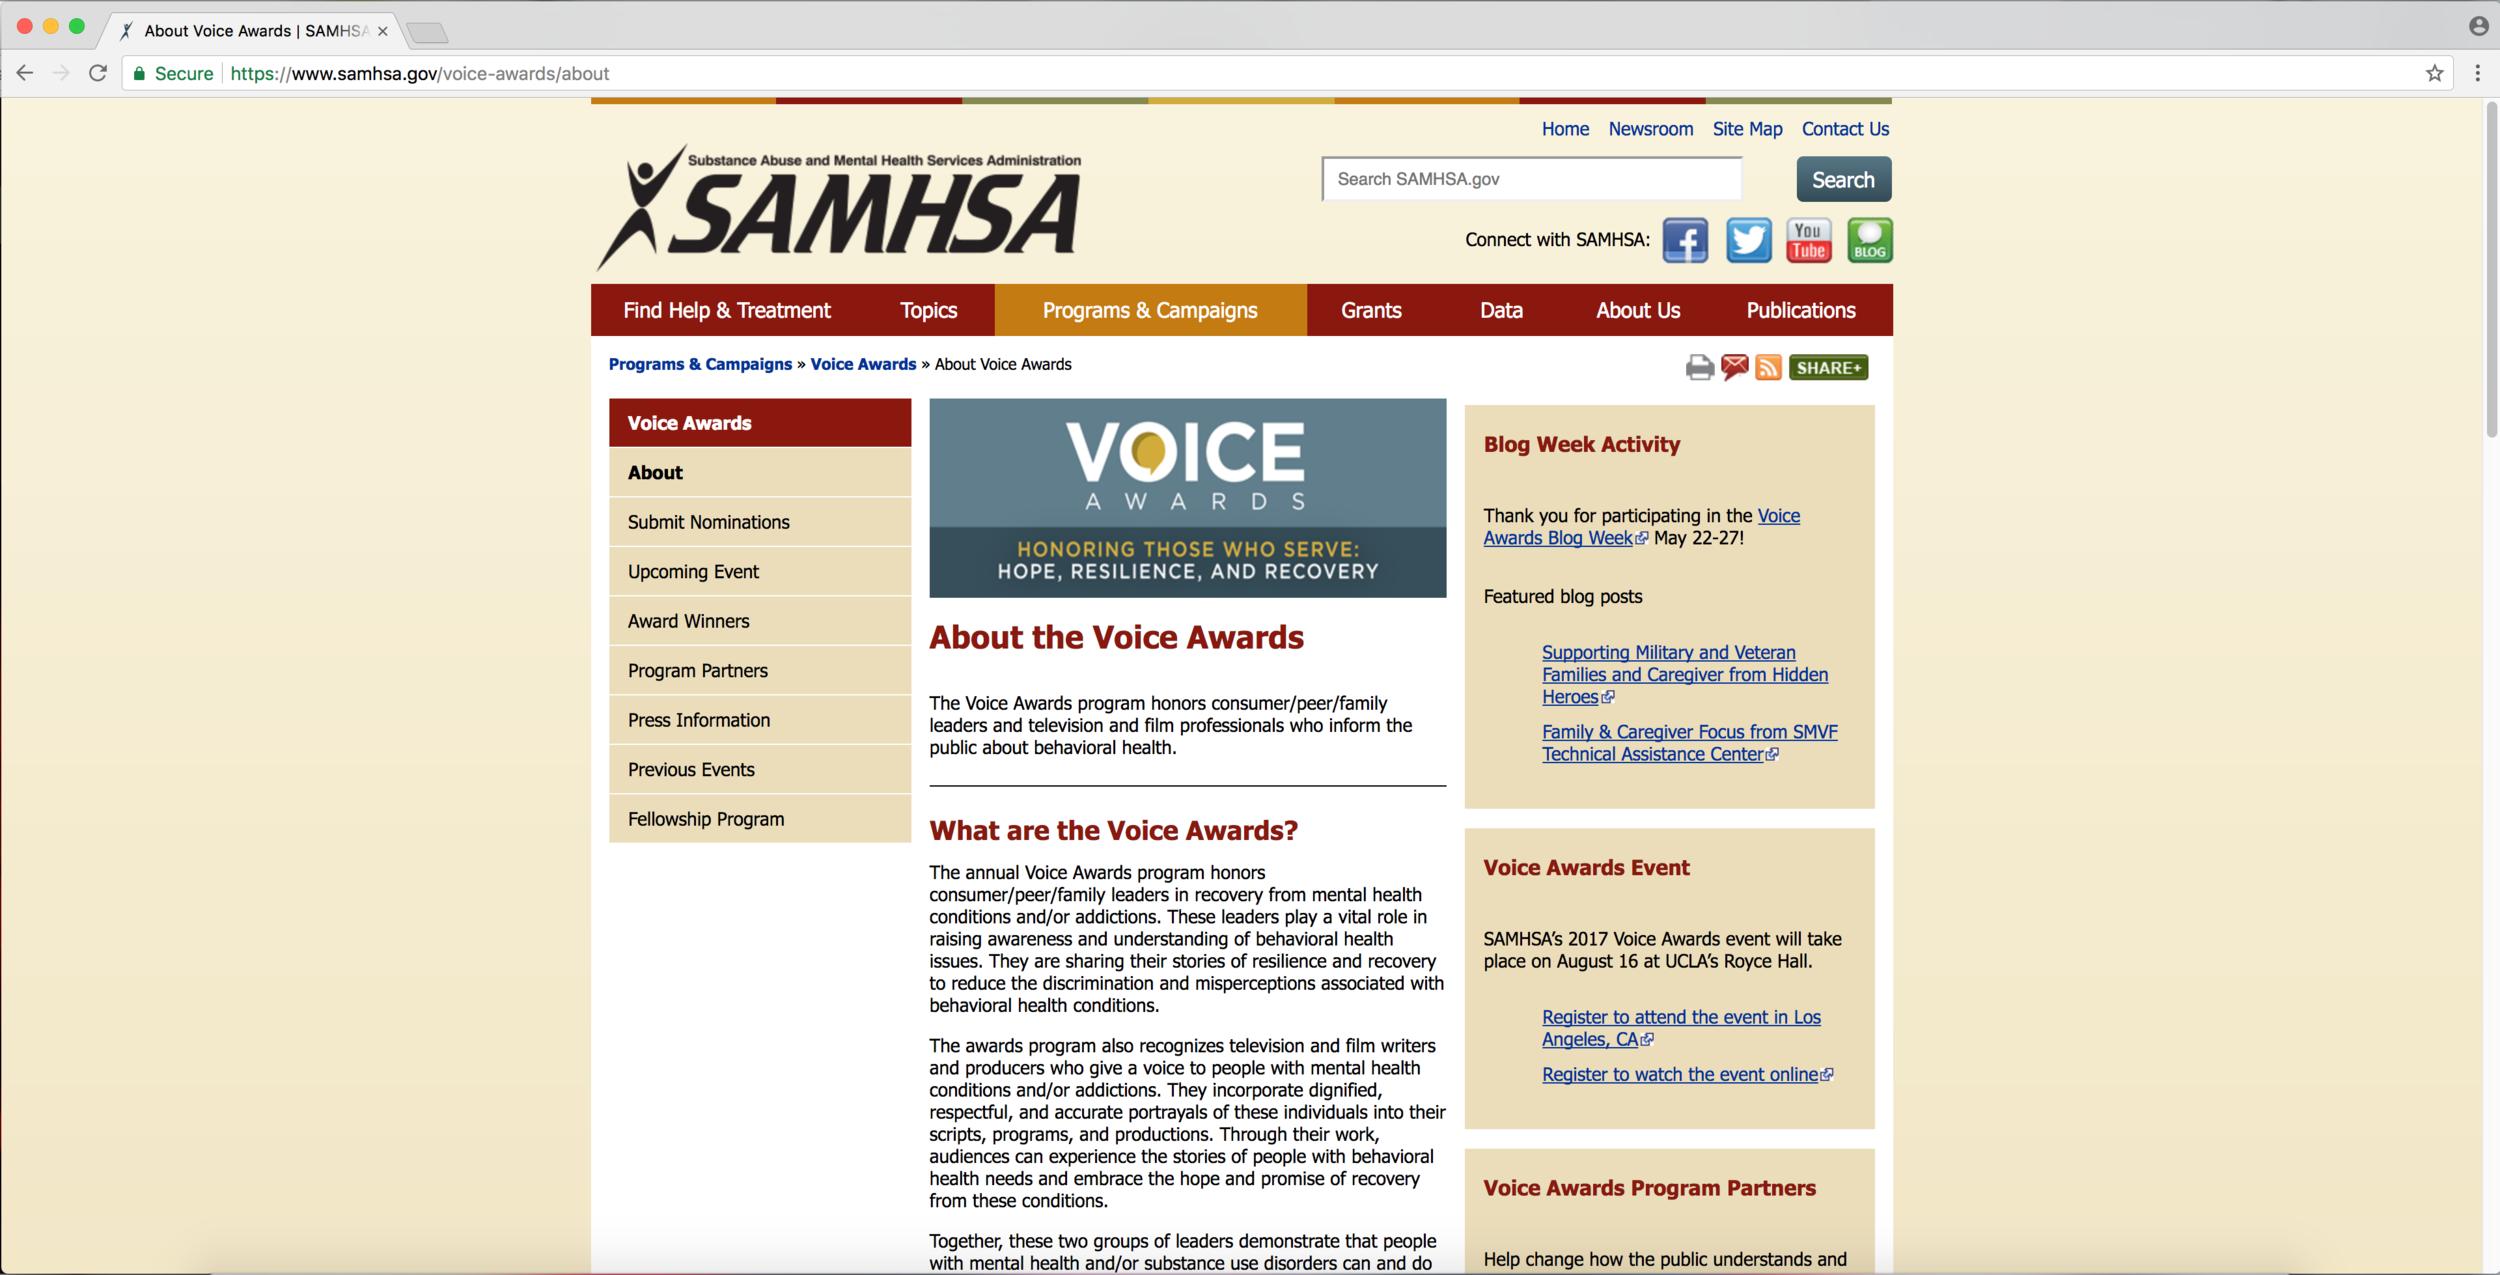 VPRP_SAMHSA2017VoiceAwards_ScreenShot.png